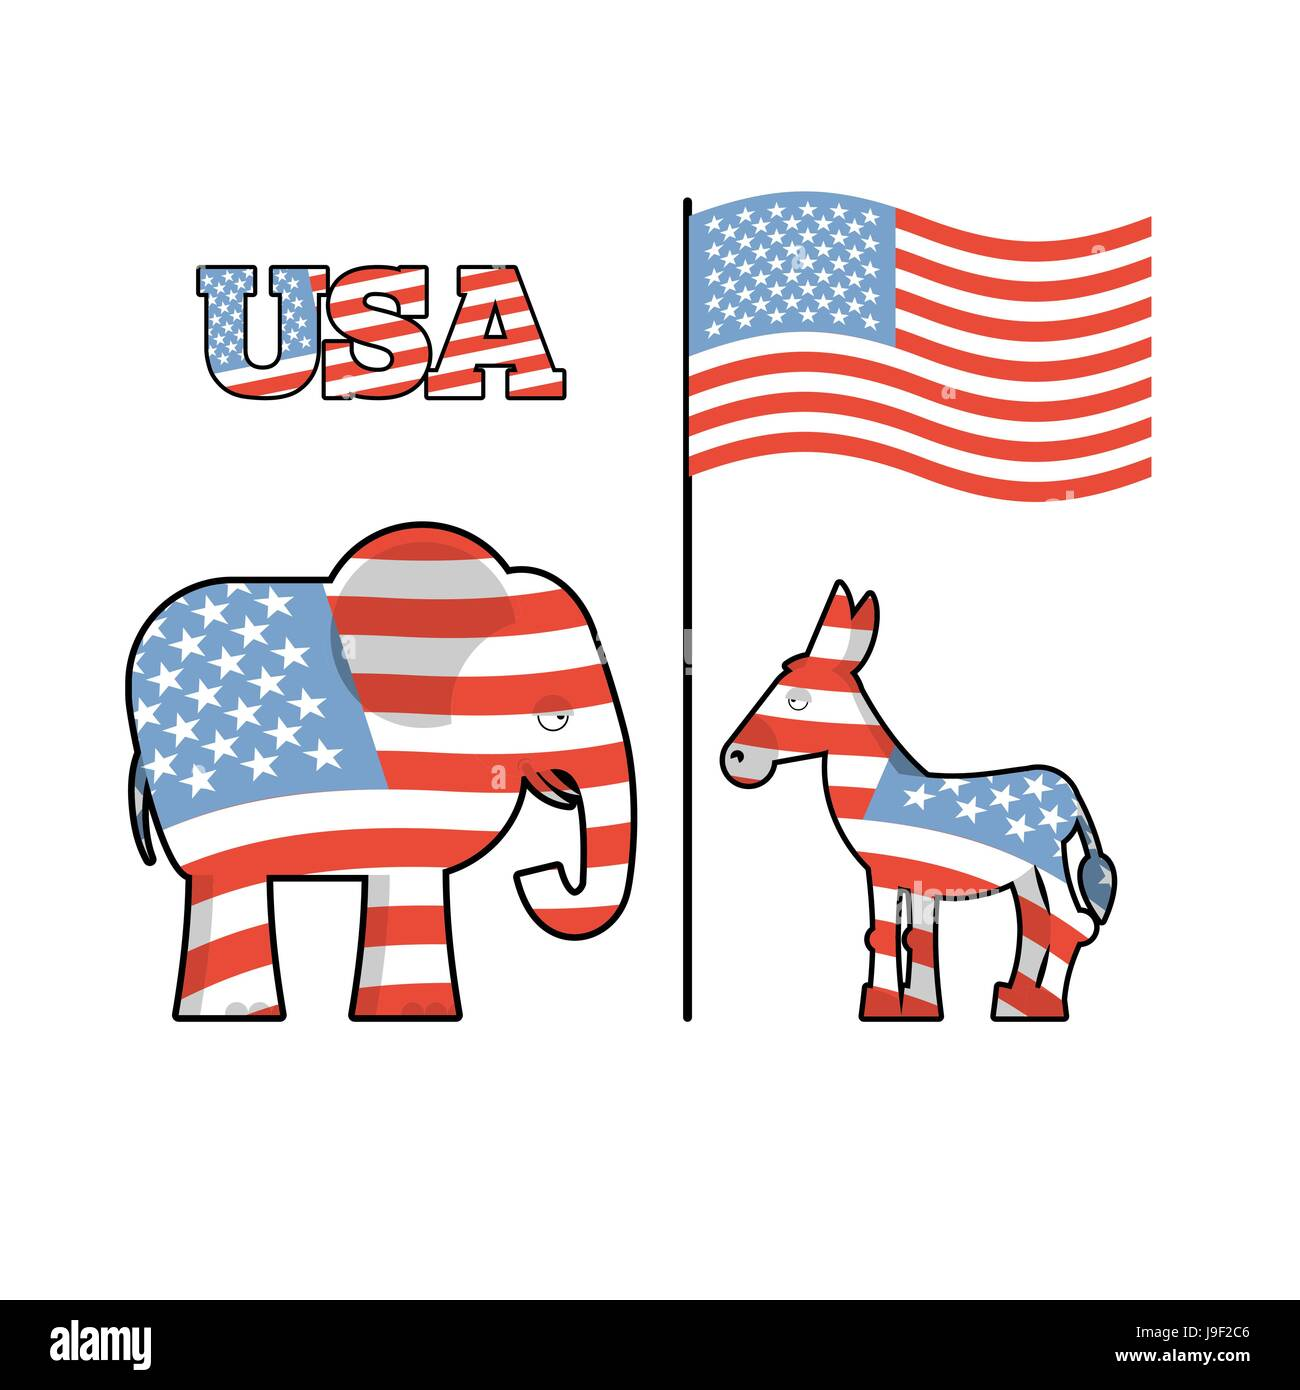 Elephant And Donkey Symbols Of Democrats And Republicans Political